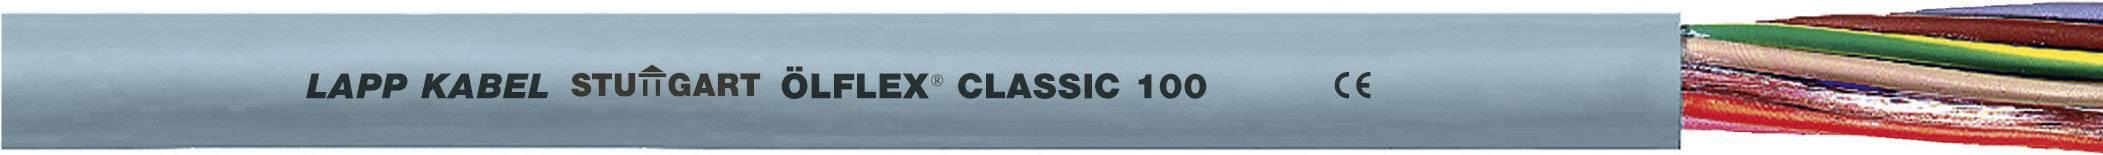 Kabel LappKabel Ölflex CLASSIC 100 6G0,5 (0010004), PVC, 6,7 mm, 500 V, šedá, 1000 m